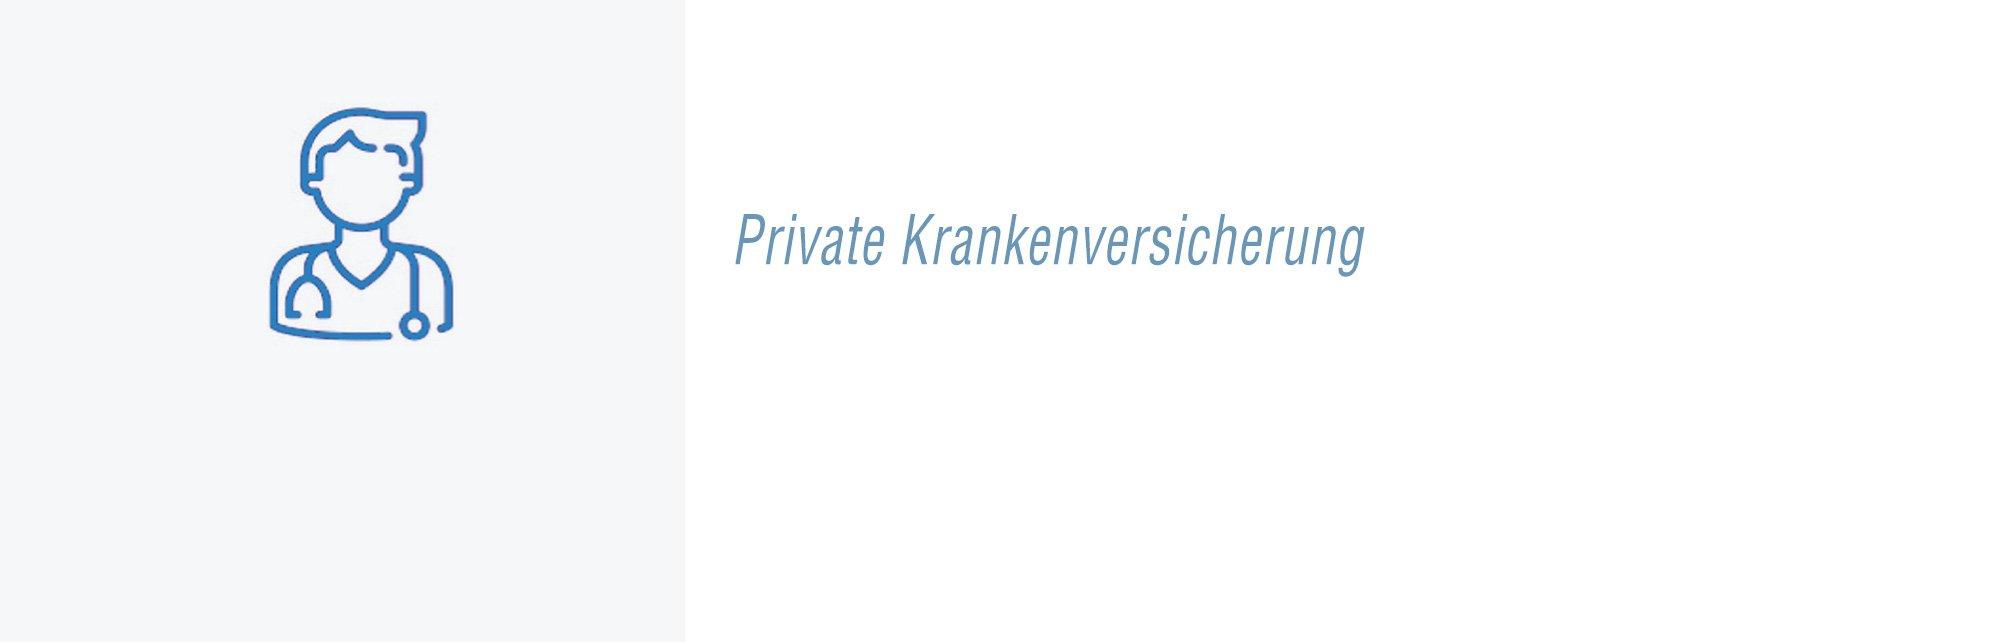 krankenversicherung genossenschaft berlin